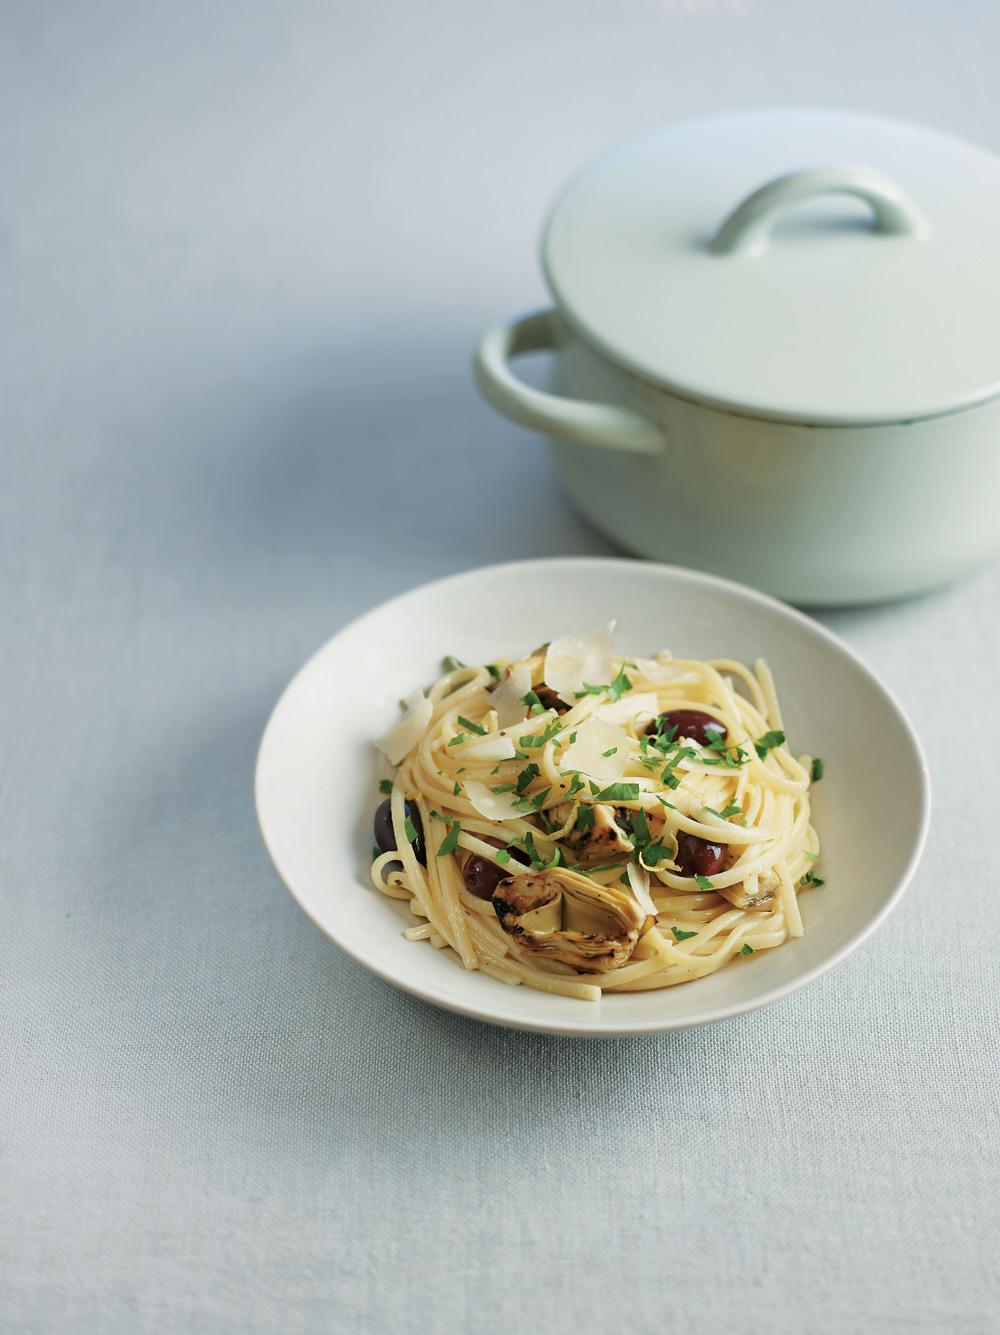 Artichoke, Olive and Lemon Linguine